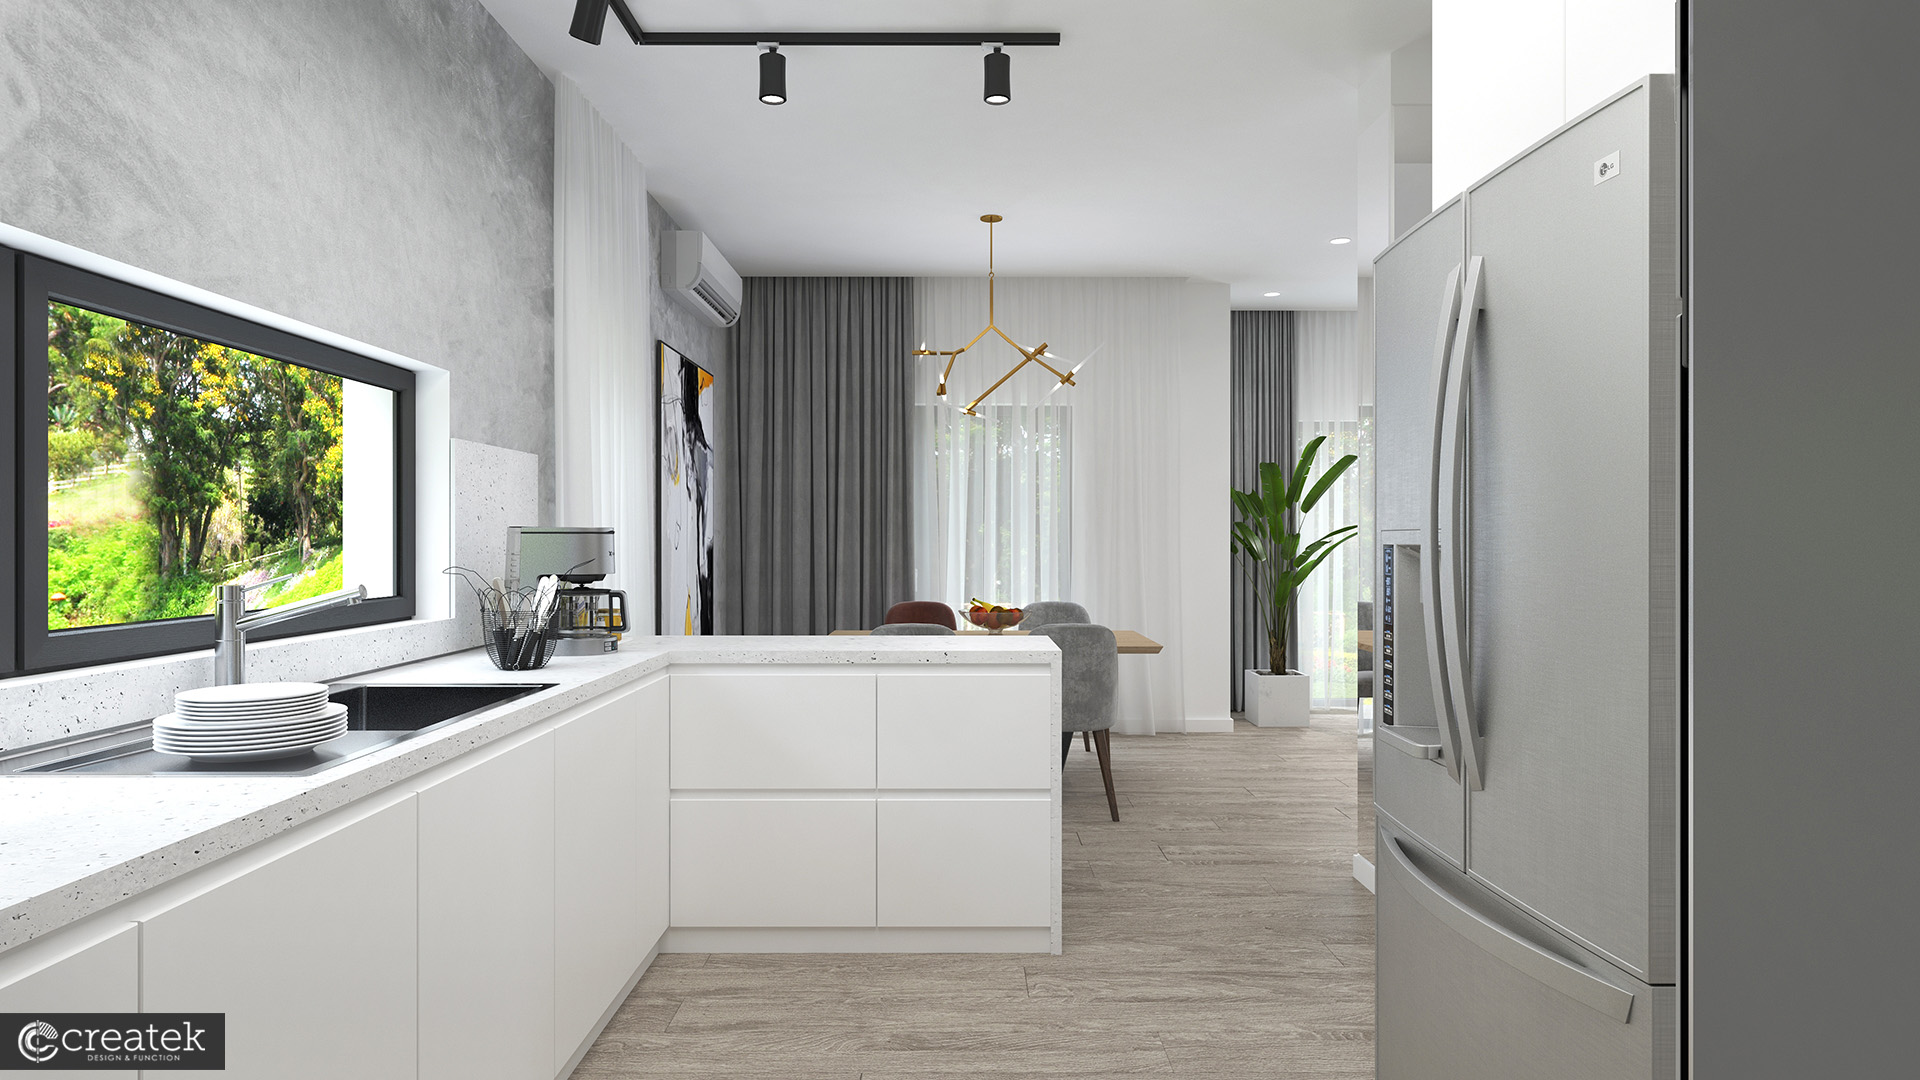 012-Bucatarie-Design-Interior-Casa-Ovidiu-Lac